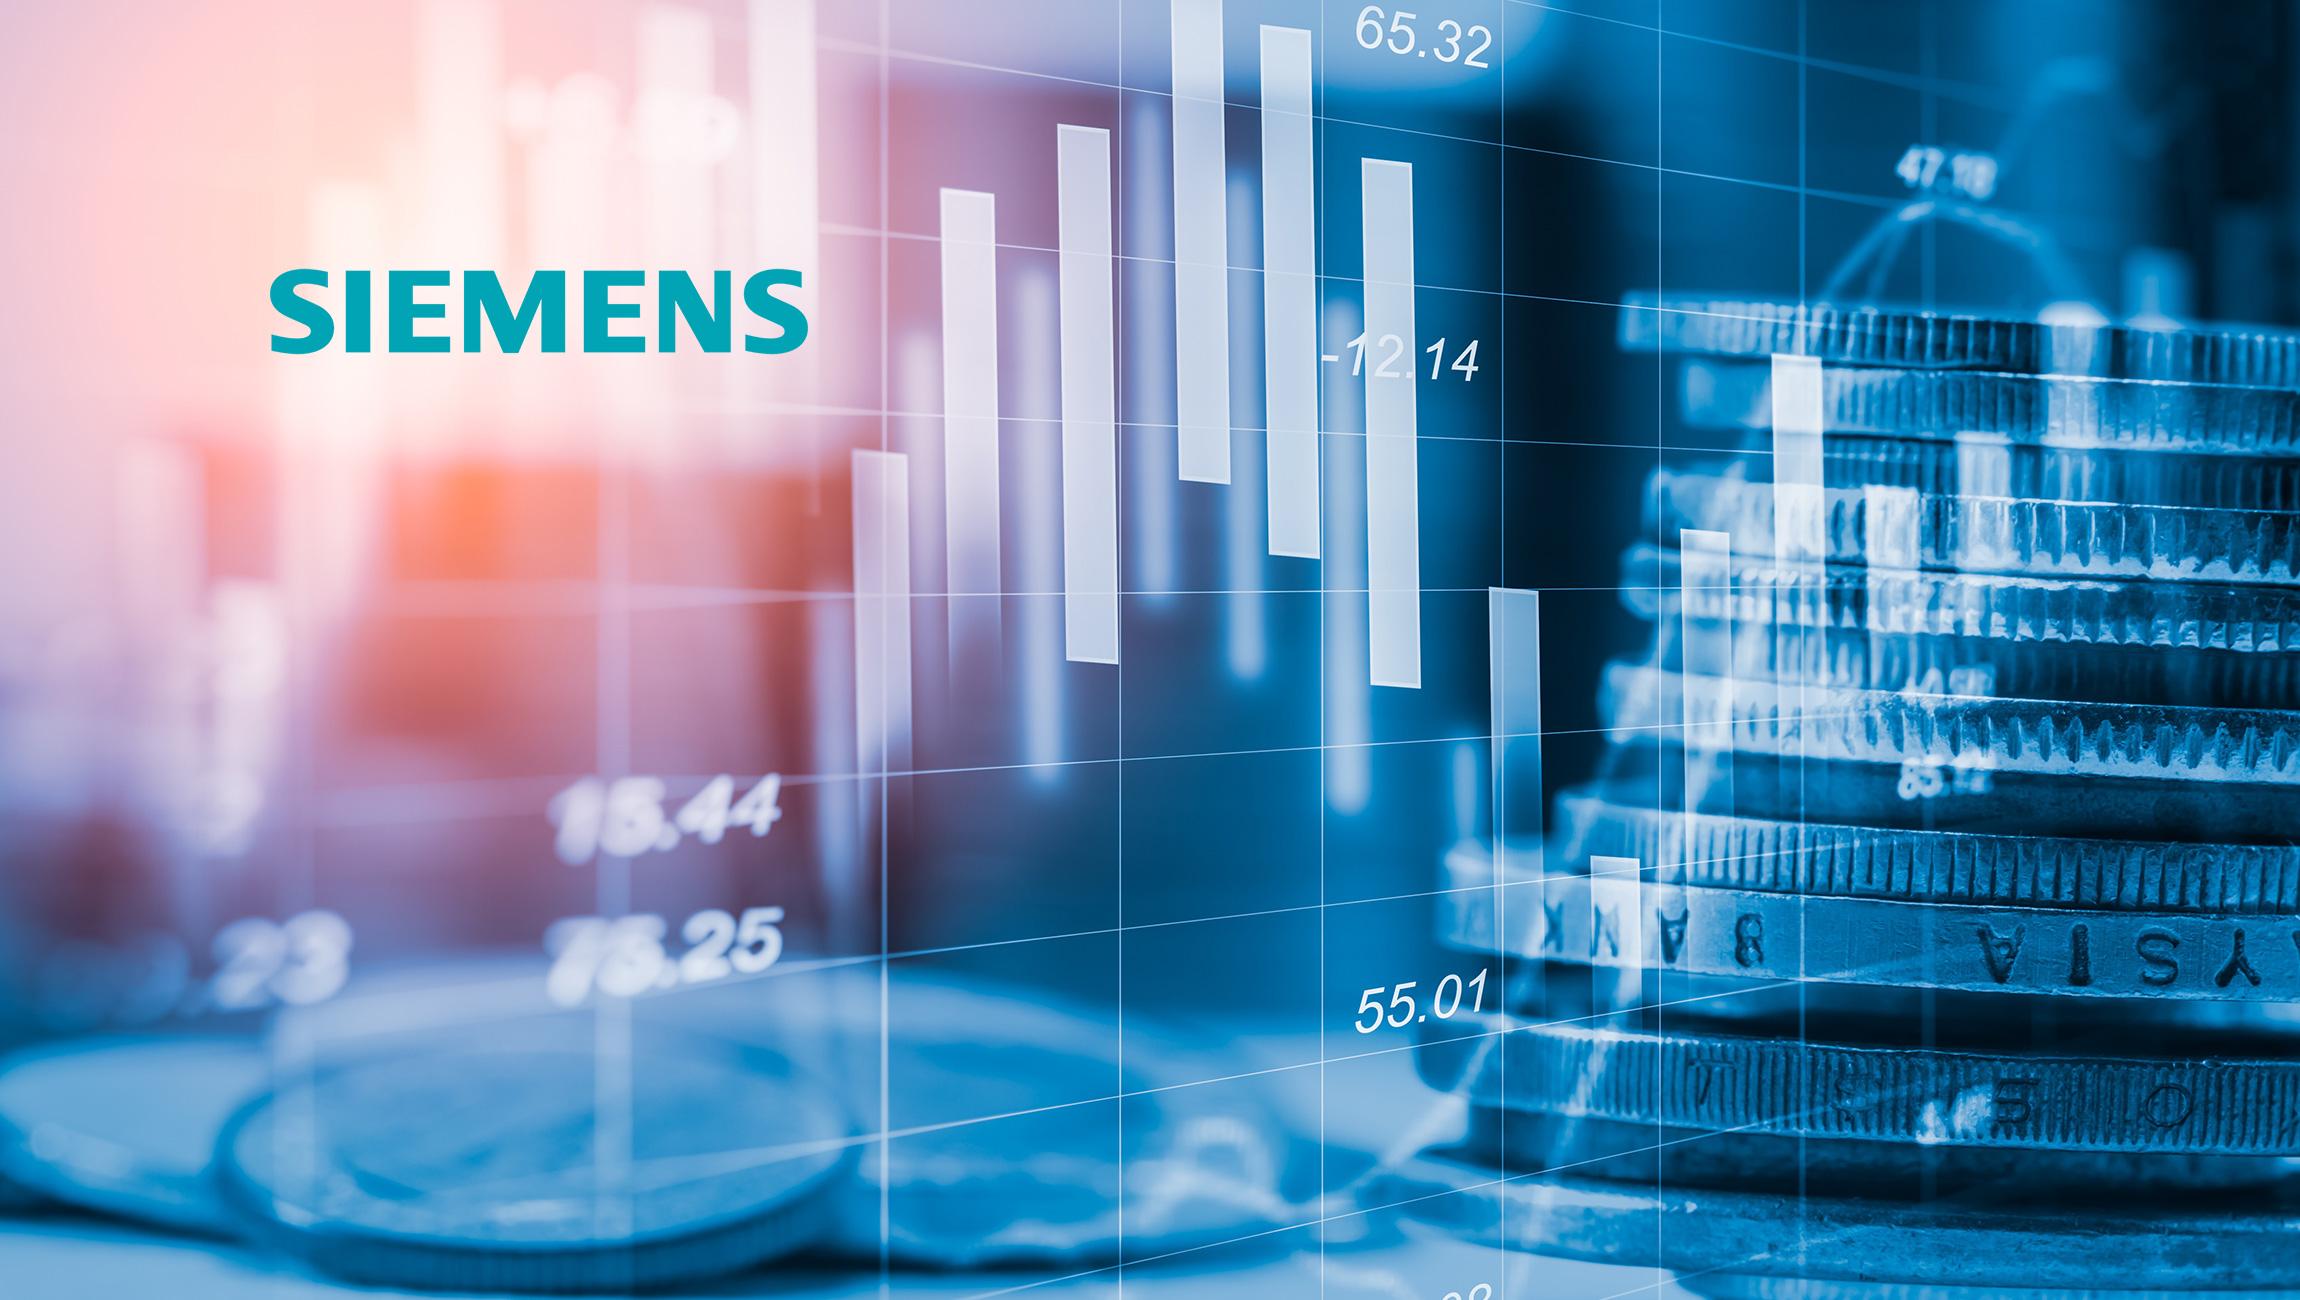 Siemens Announced Profit In Its Quarter Result